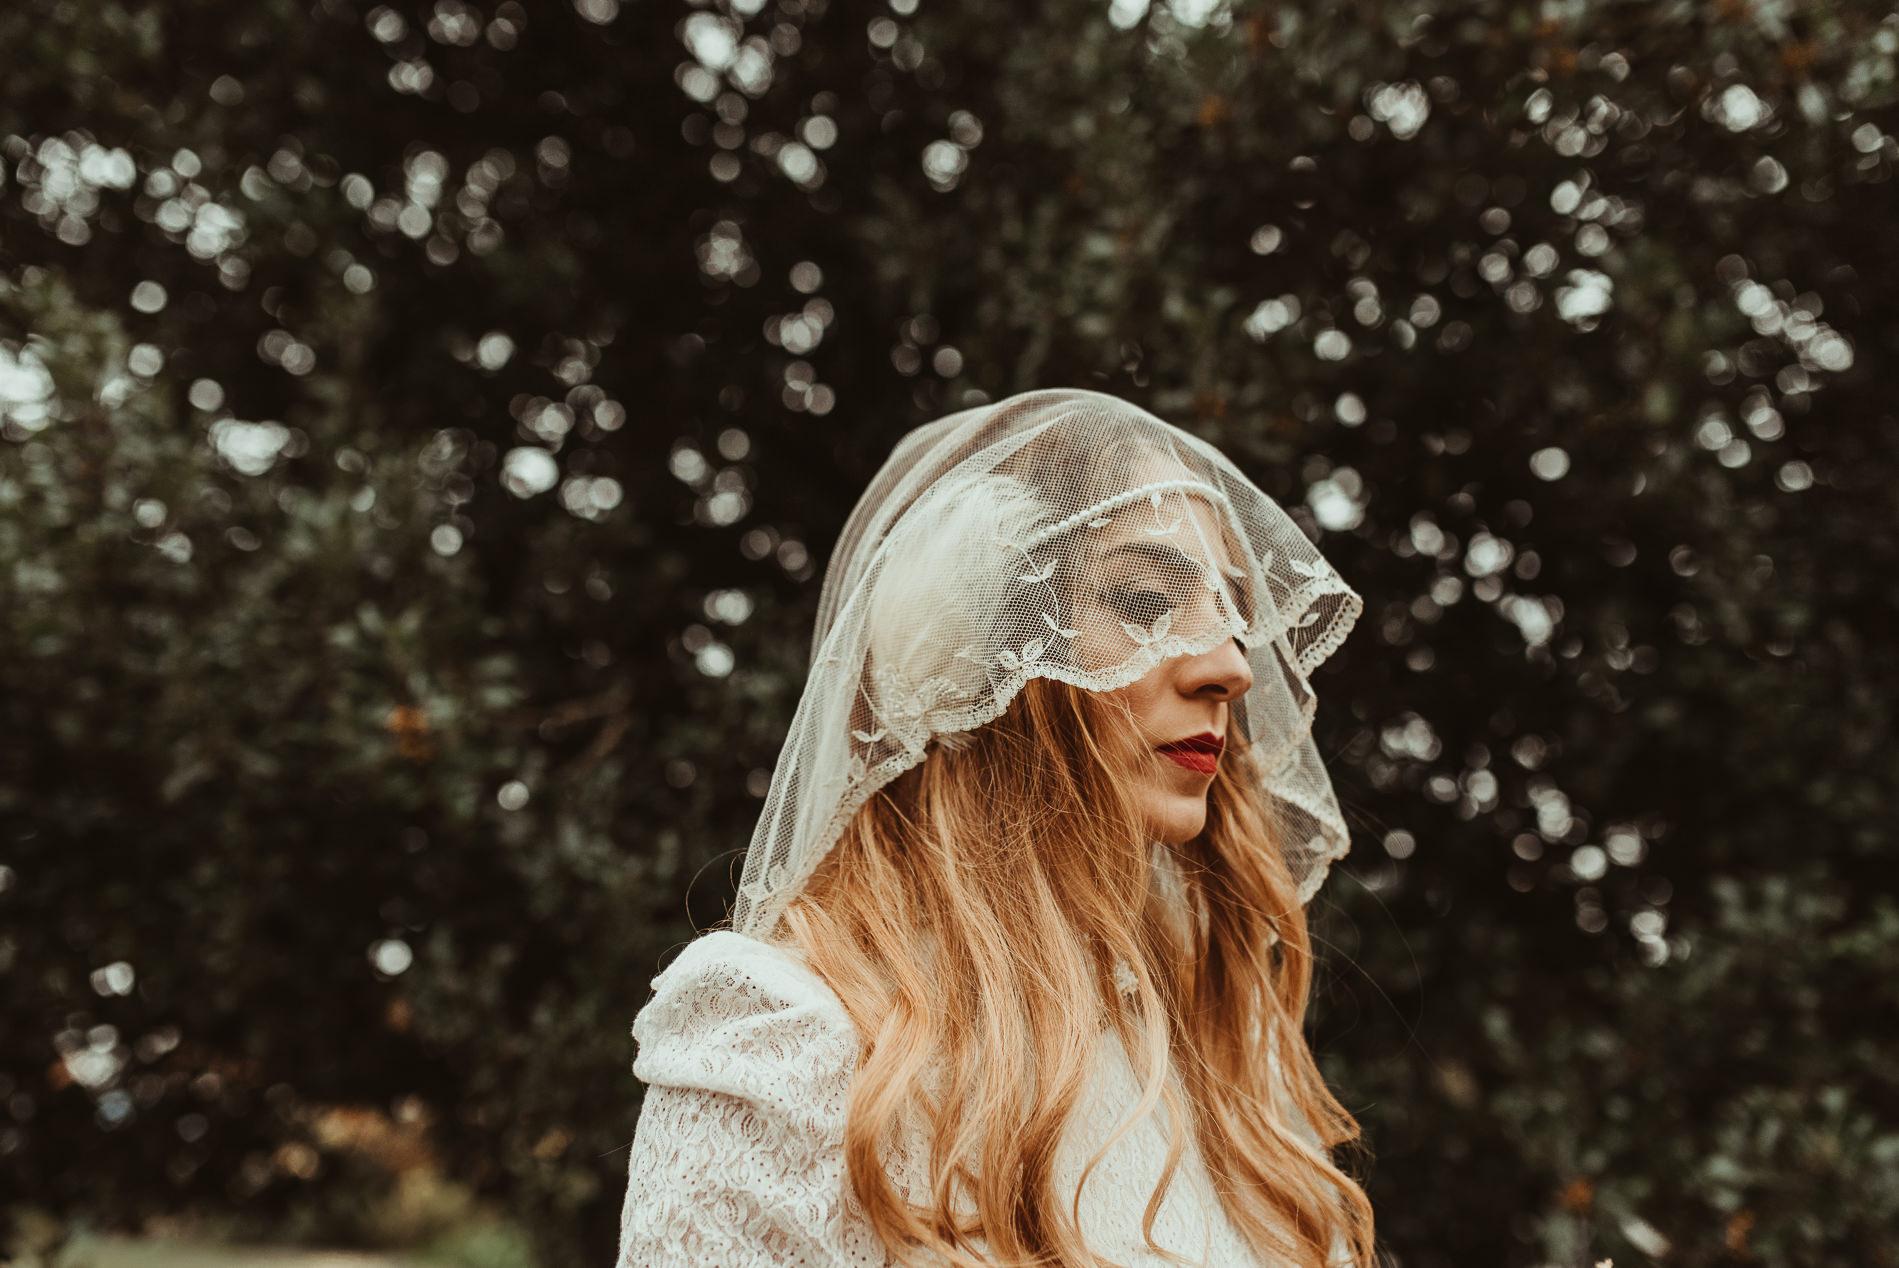 bohemian_wedding_lawshall_church_garden35